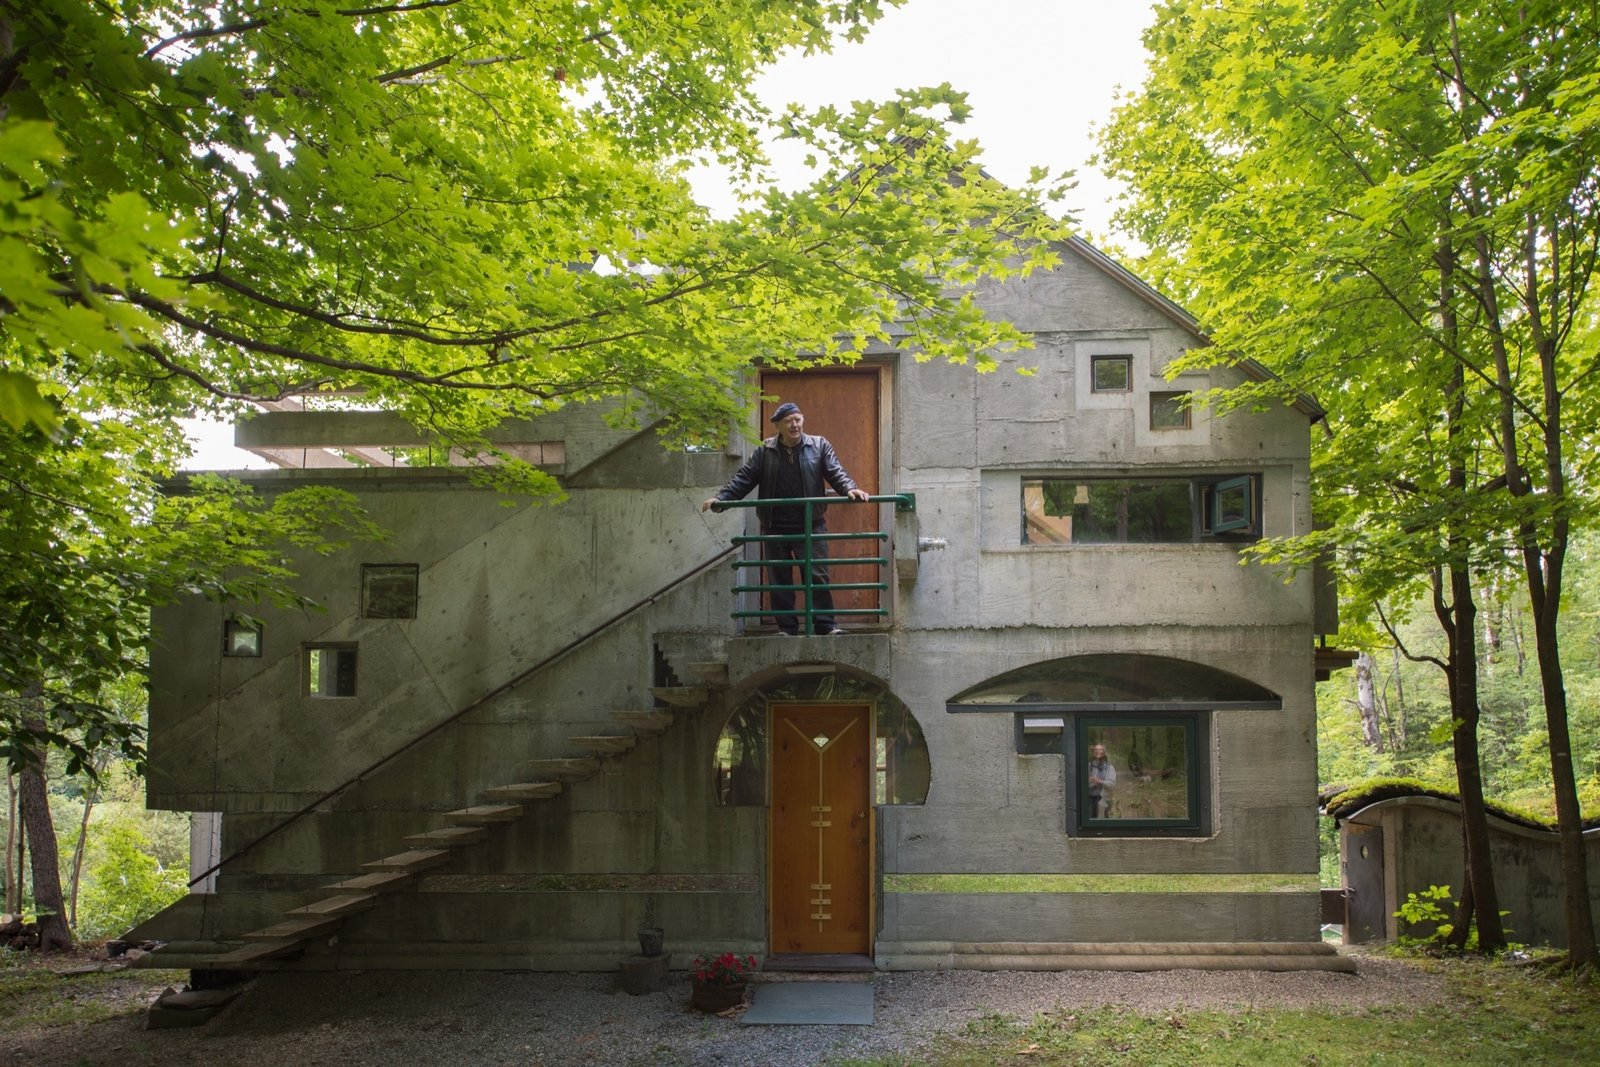 Photo 4 of 11 in Architecture Improv